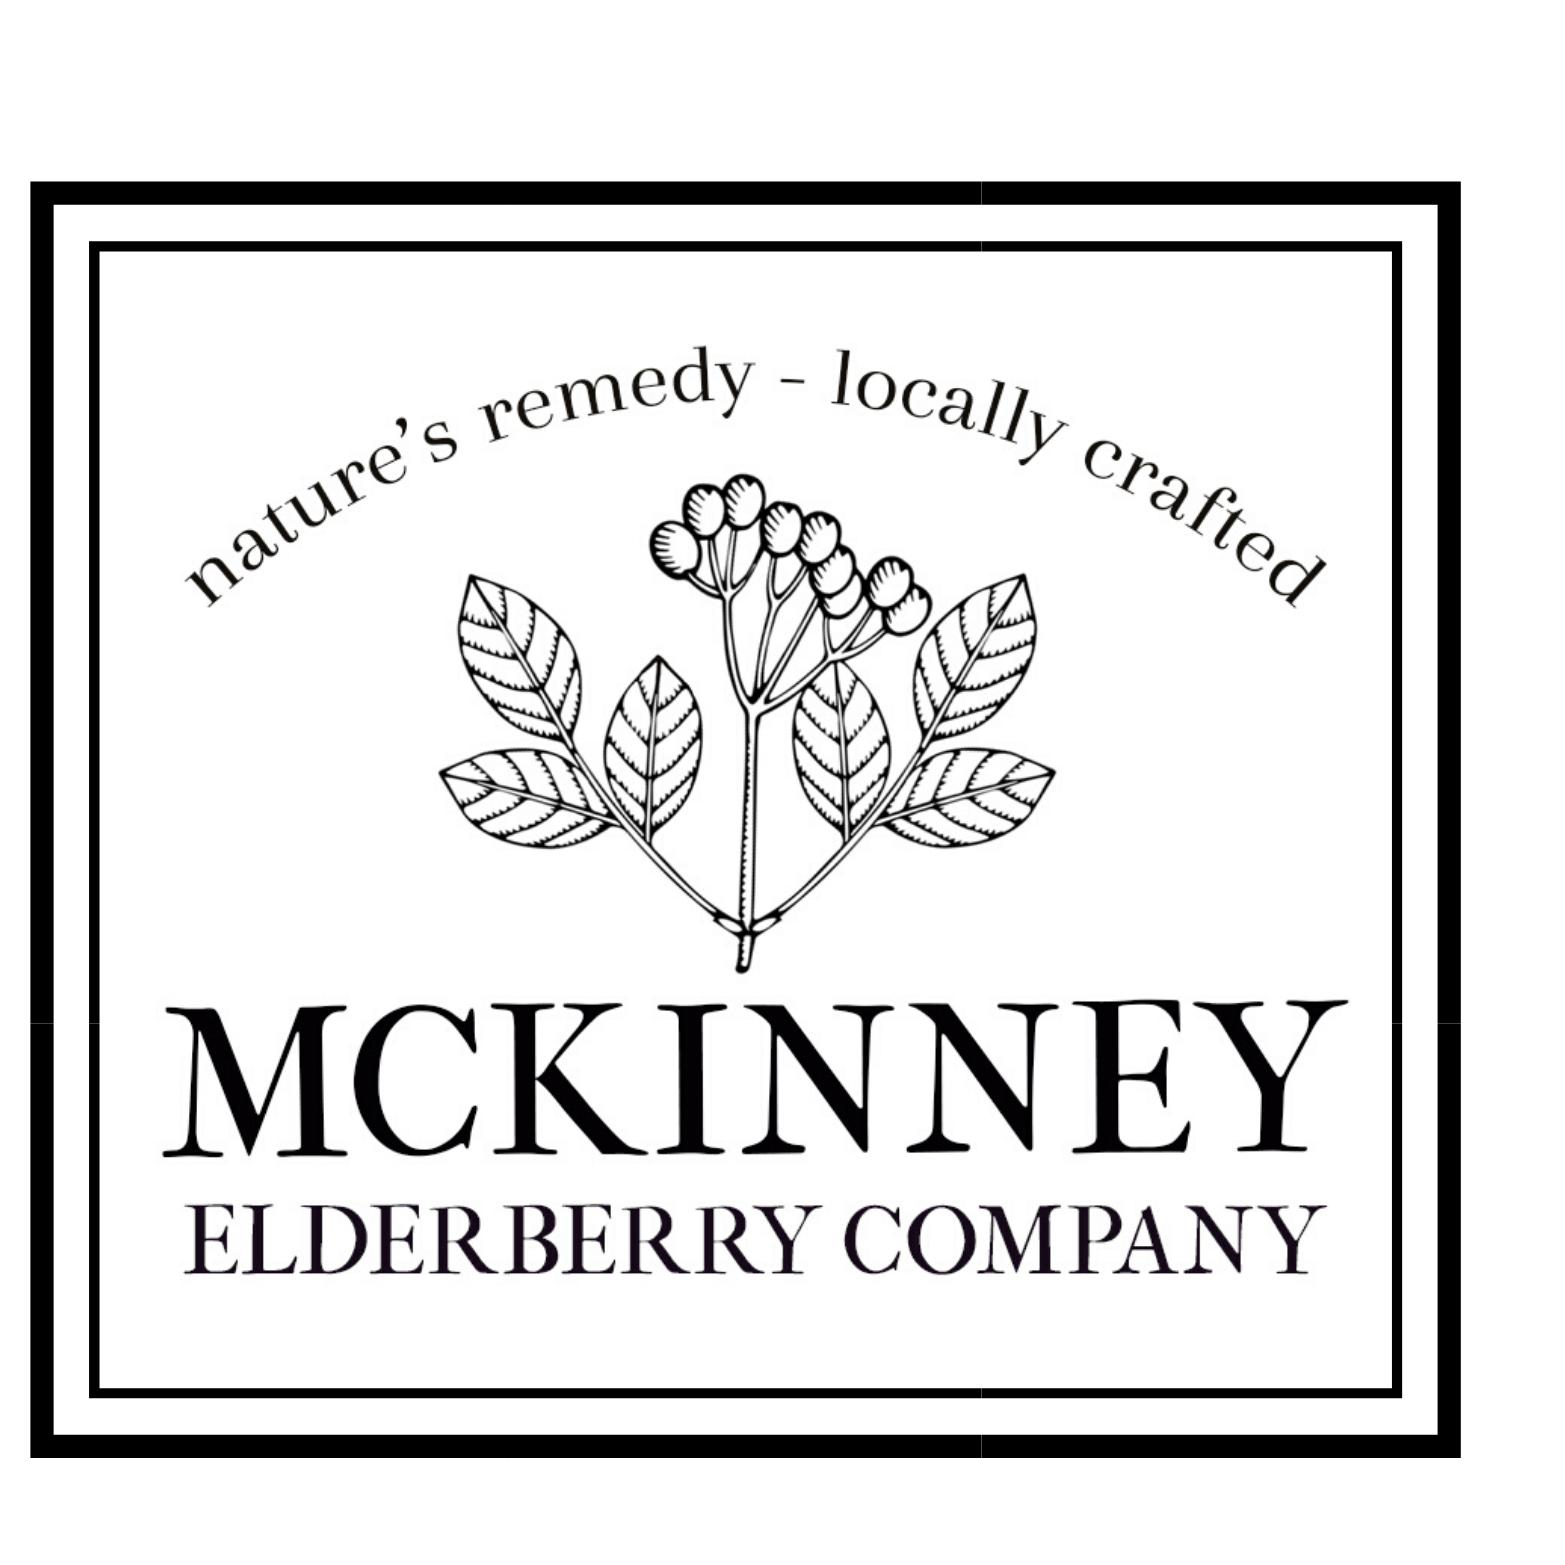 McKinney Elderberry Co.